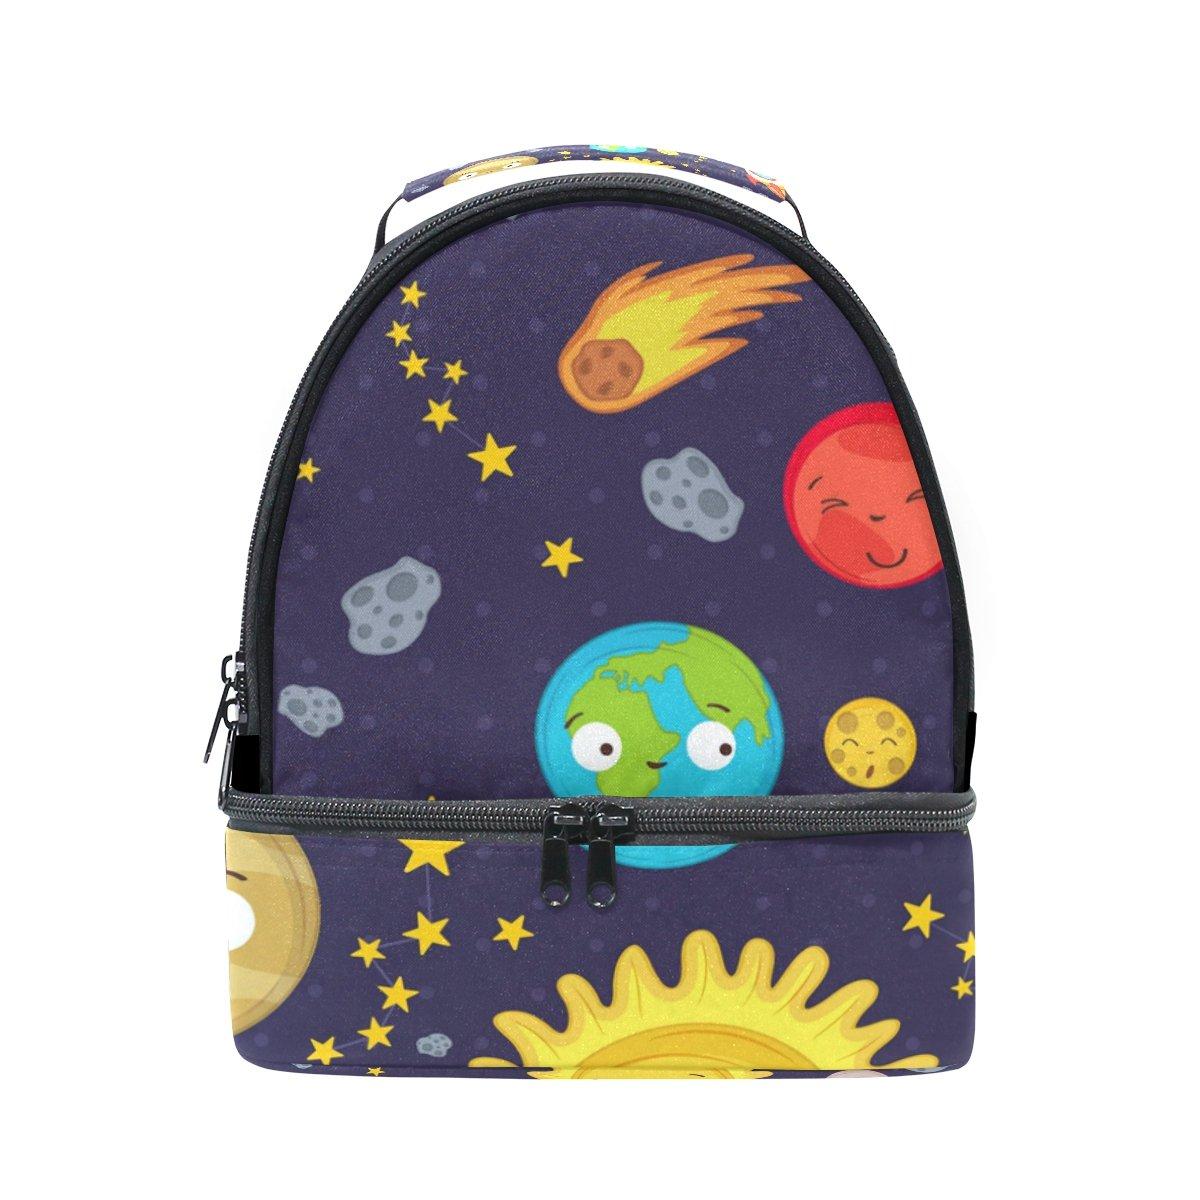 U LIFE Cute Emoji Solar Sun Earth Planets Stars Universe Space Insulated Lunch Bag Bags Box Tote for Kids Girls Boys Women Men